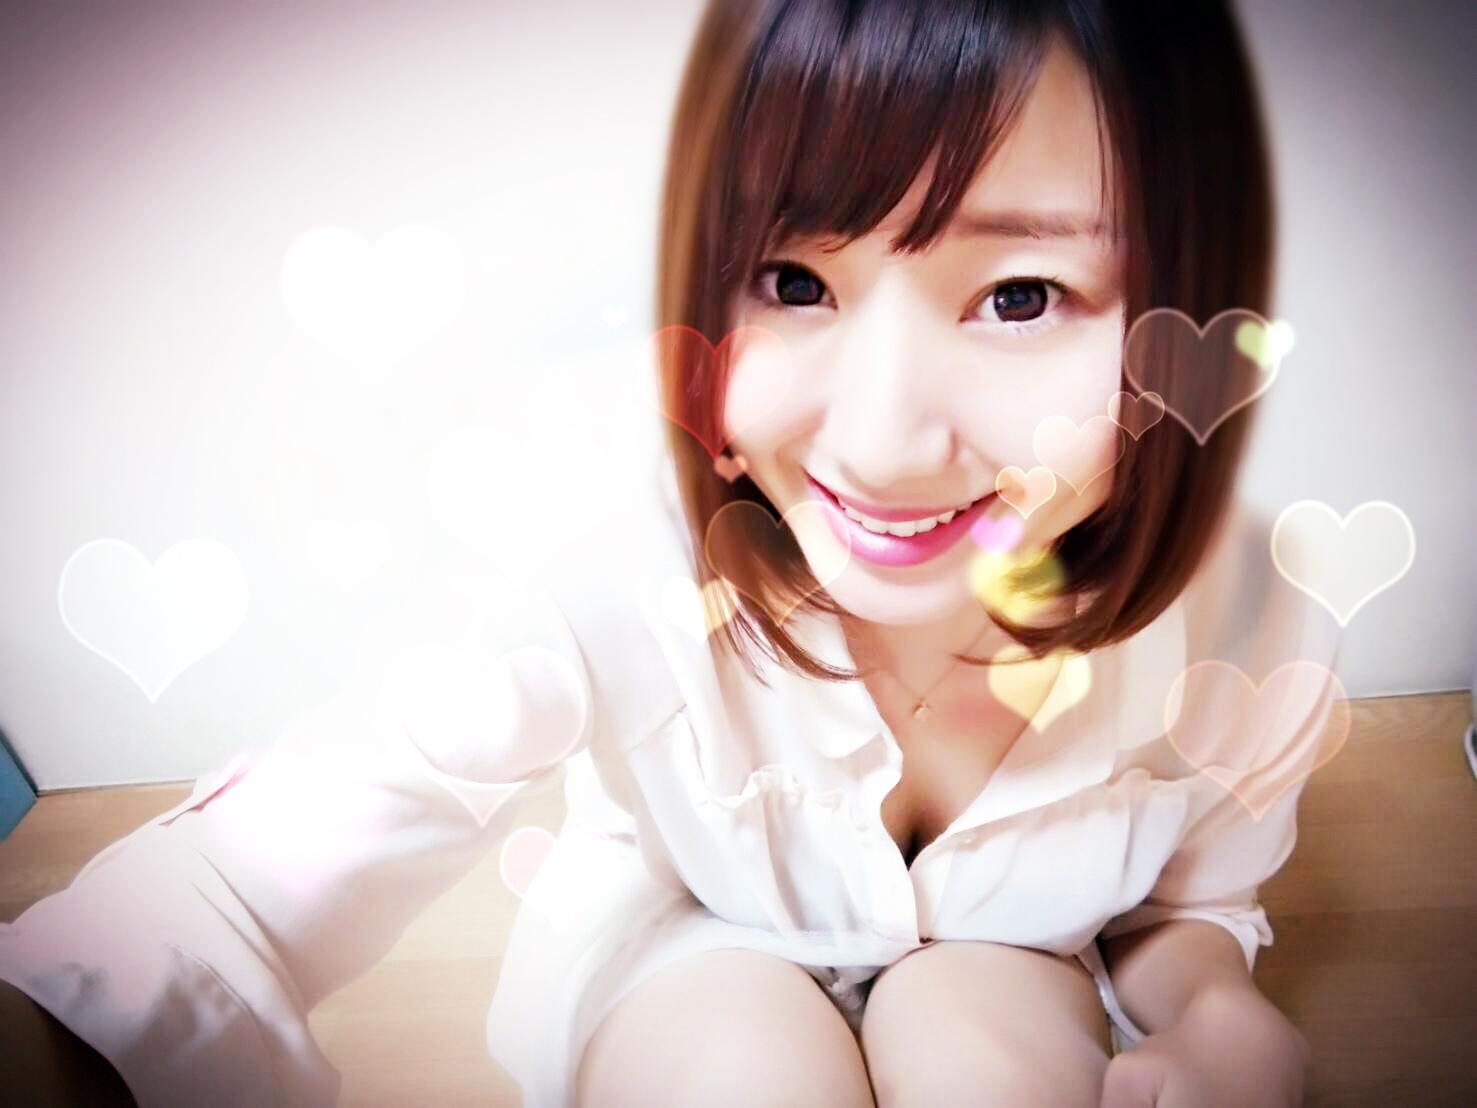 Rinaqq - Japanese webcam girl